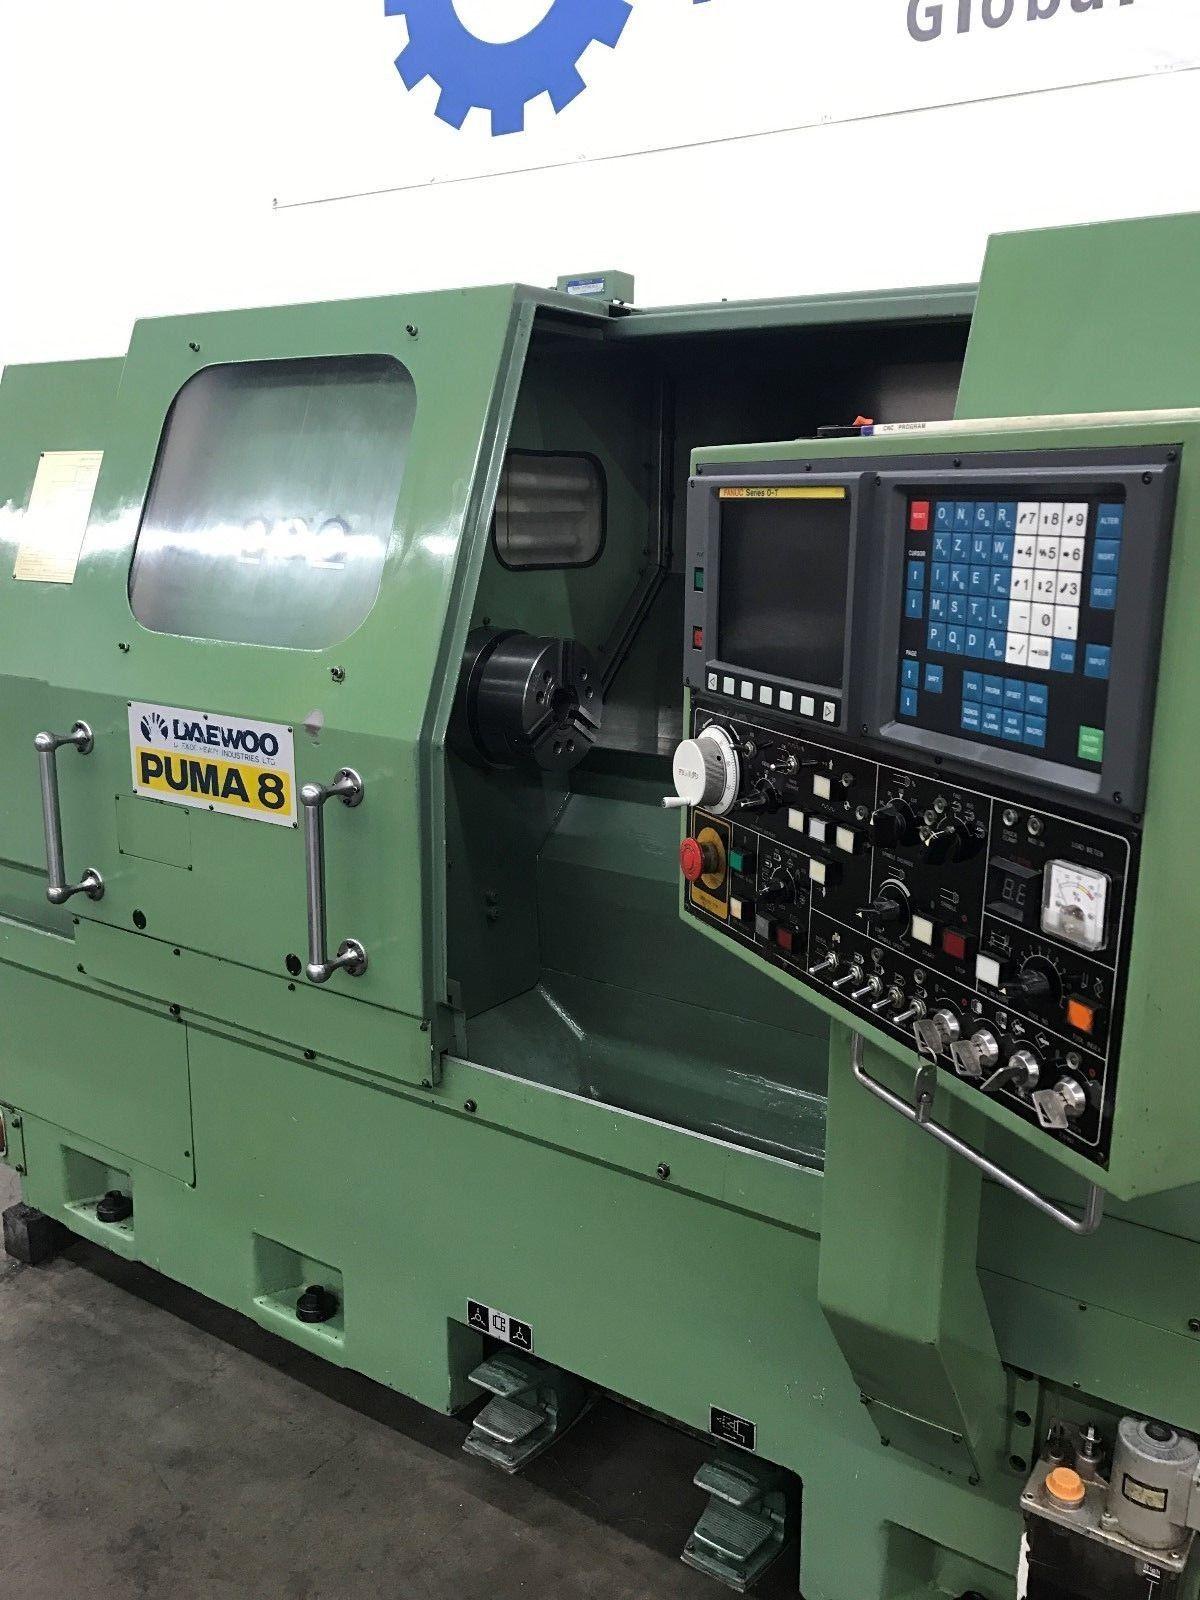 Daewoo Puma 8 CNC Turning Center - MachineStation